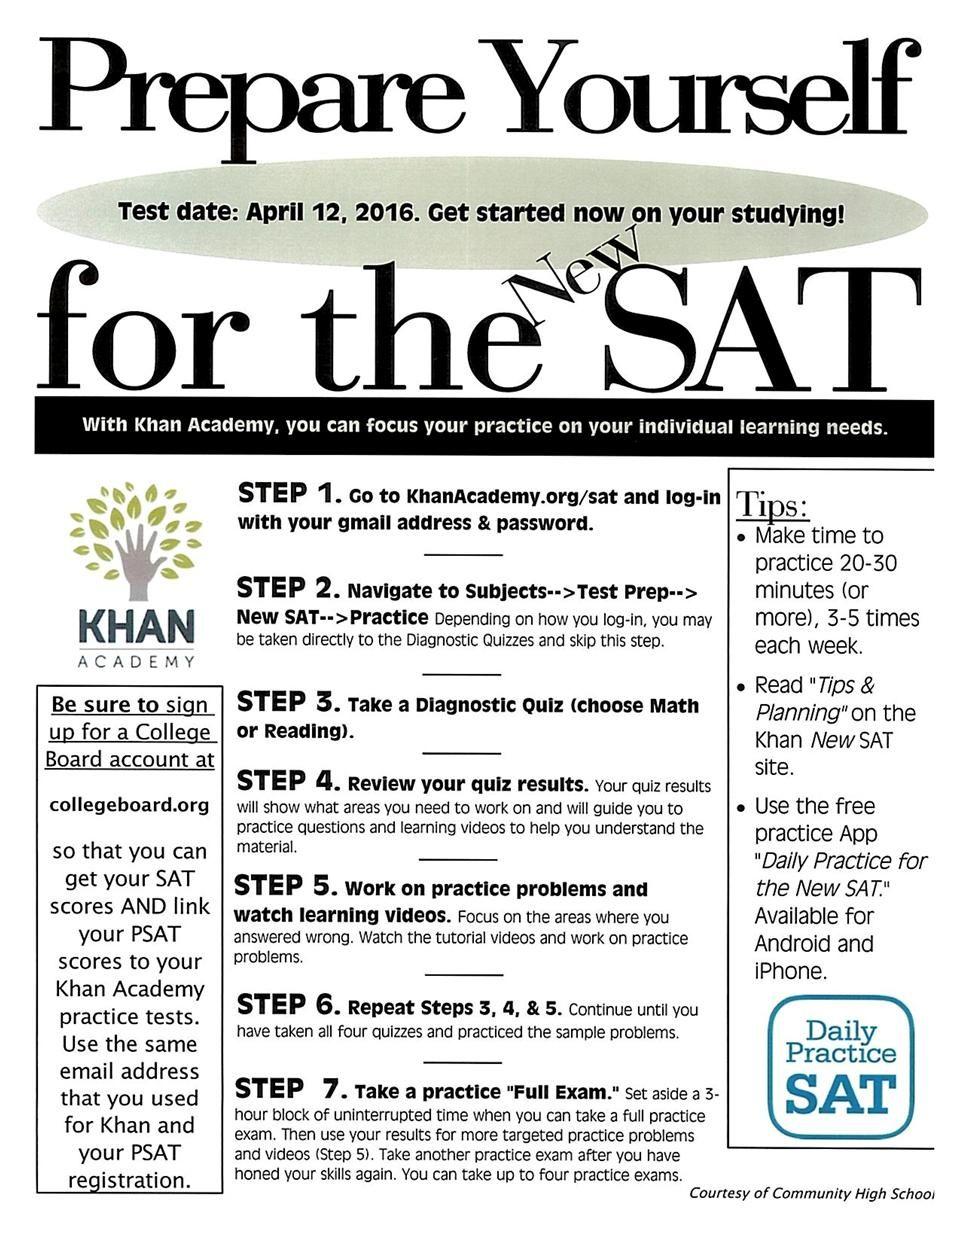 Sat Preparation Prepare Yourself For The New Sat Handout High School Hacks Junior Year High School High School Advice